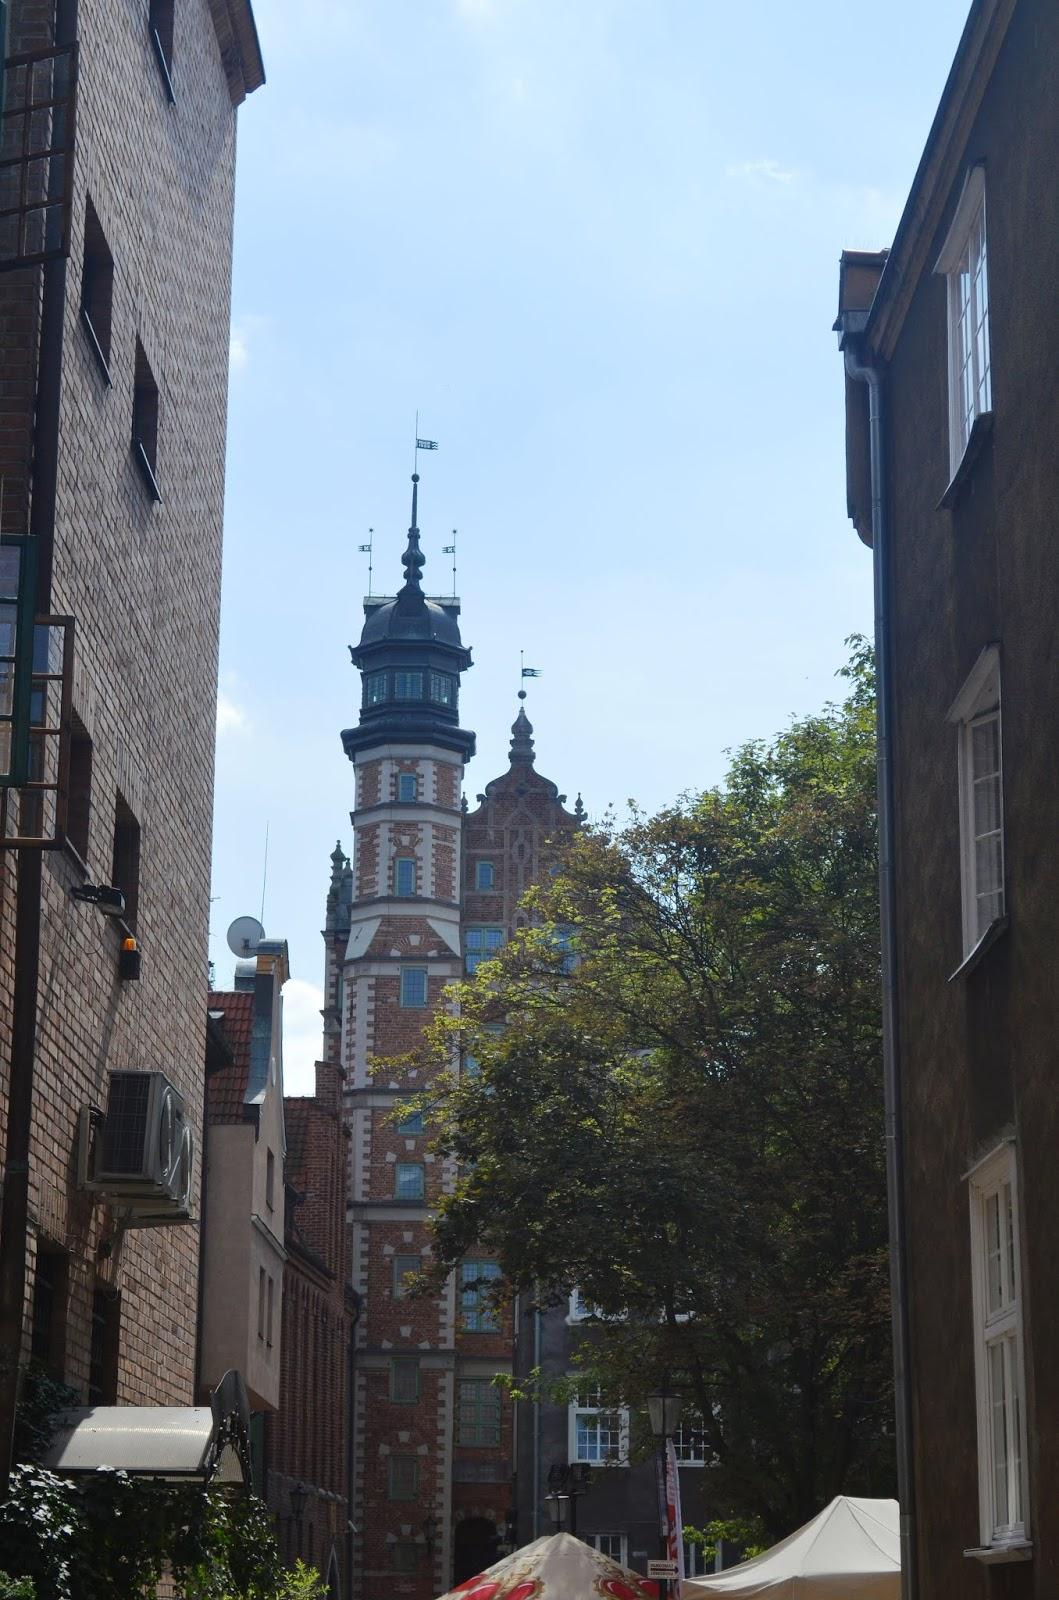 Gdańsk - old city in Poland